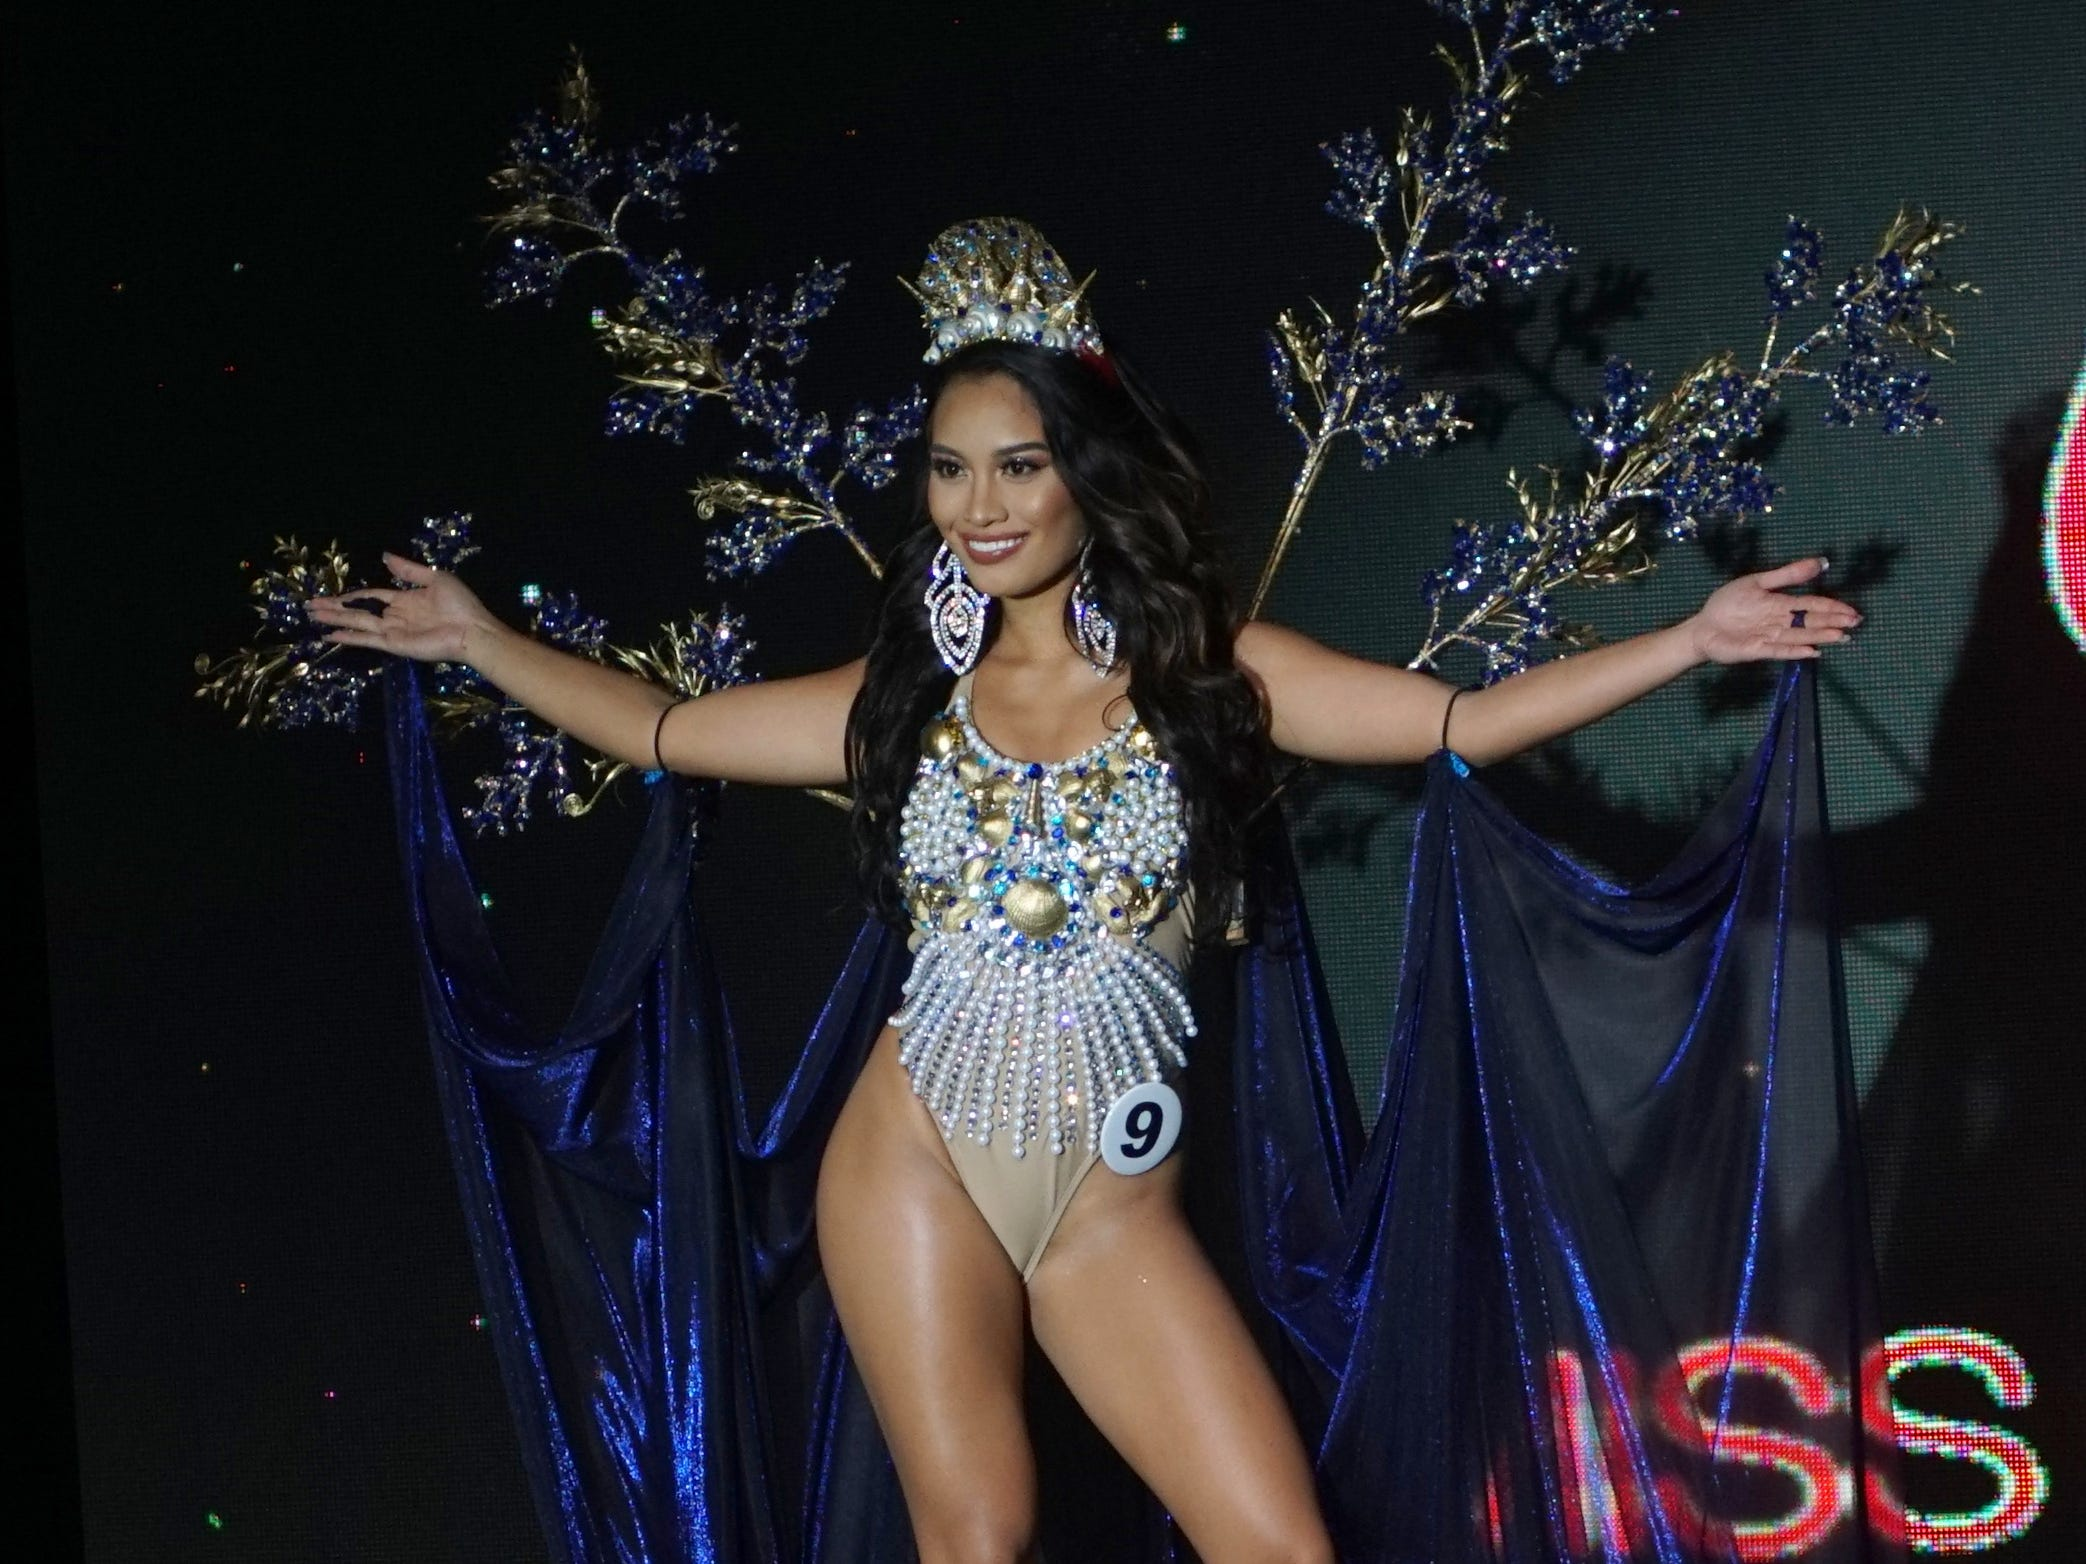 Native Costume portion of the Miss Universe Guam pageant.  Contestant 9 Celine Nicole Almero Comia.  The pageant was held at  Sheraton Laguna Guam Resort.